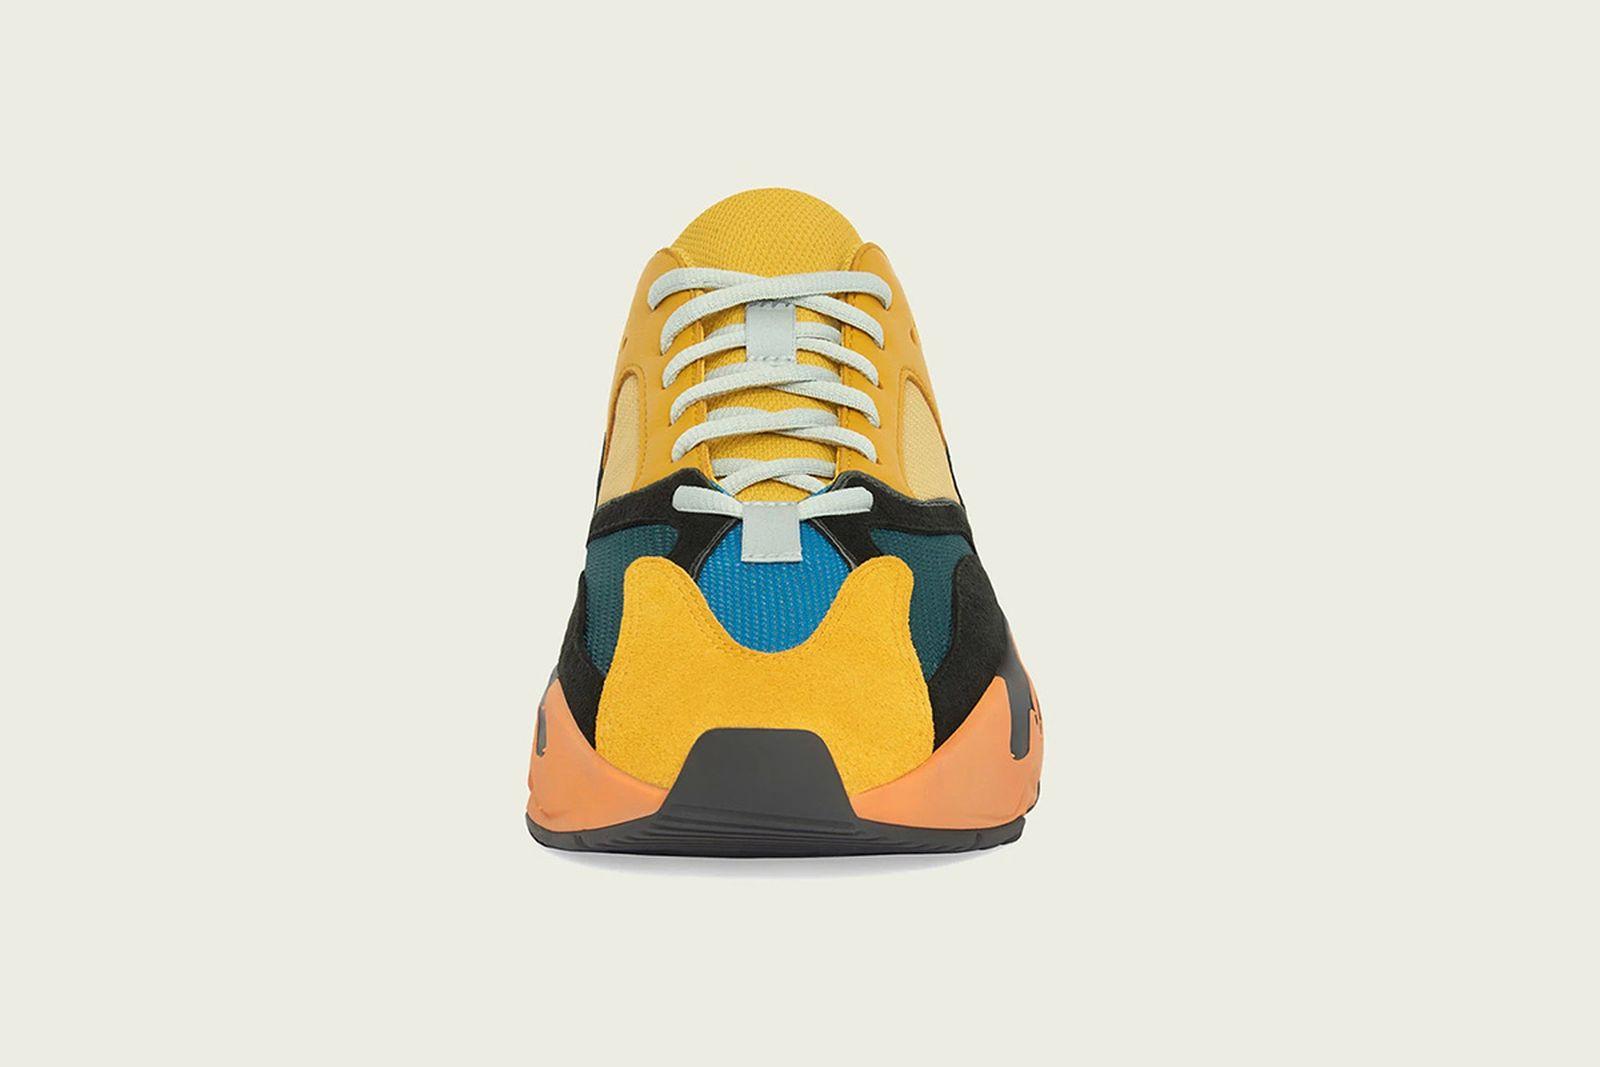 adidas-yeezy-boost-700-sun-release-date-price-03